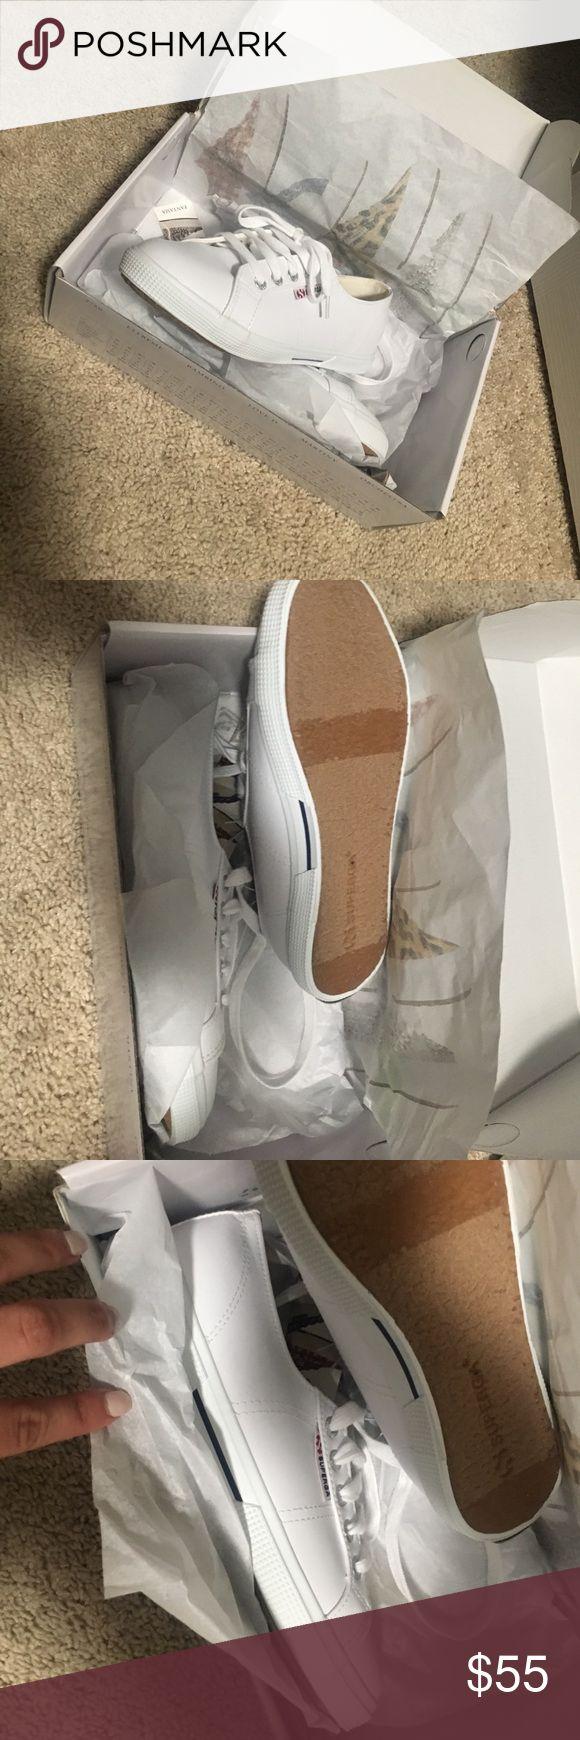 Superga white sneakers Brand new in box white superga sneakers Superga Shoes